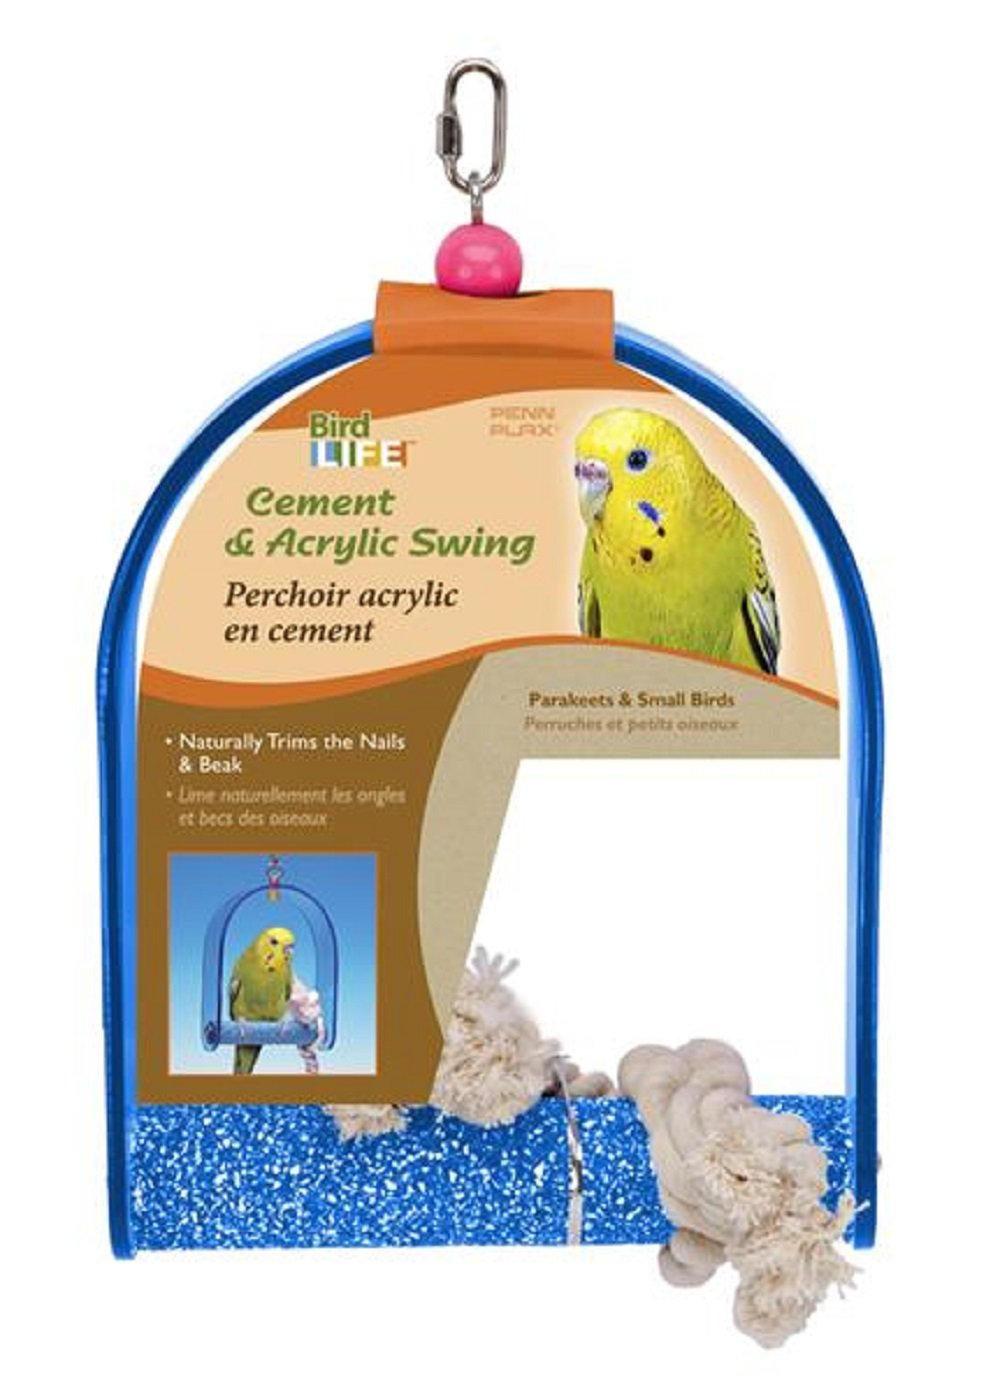 Penn Plax Cement and Acrylic Swing with Rope Bird Toy – Small Bird Penn-Plax BA270